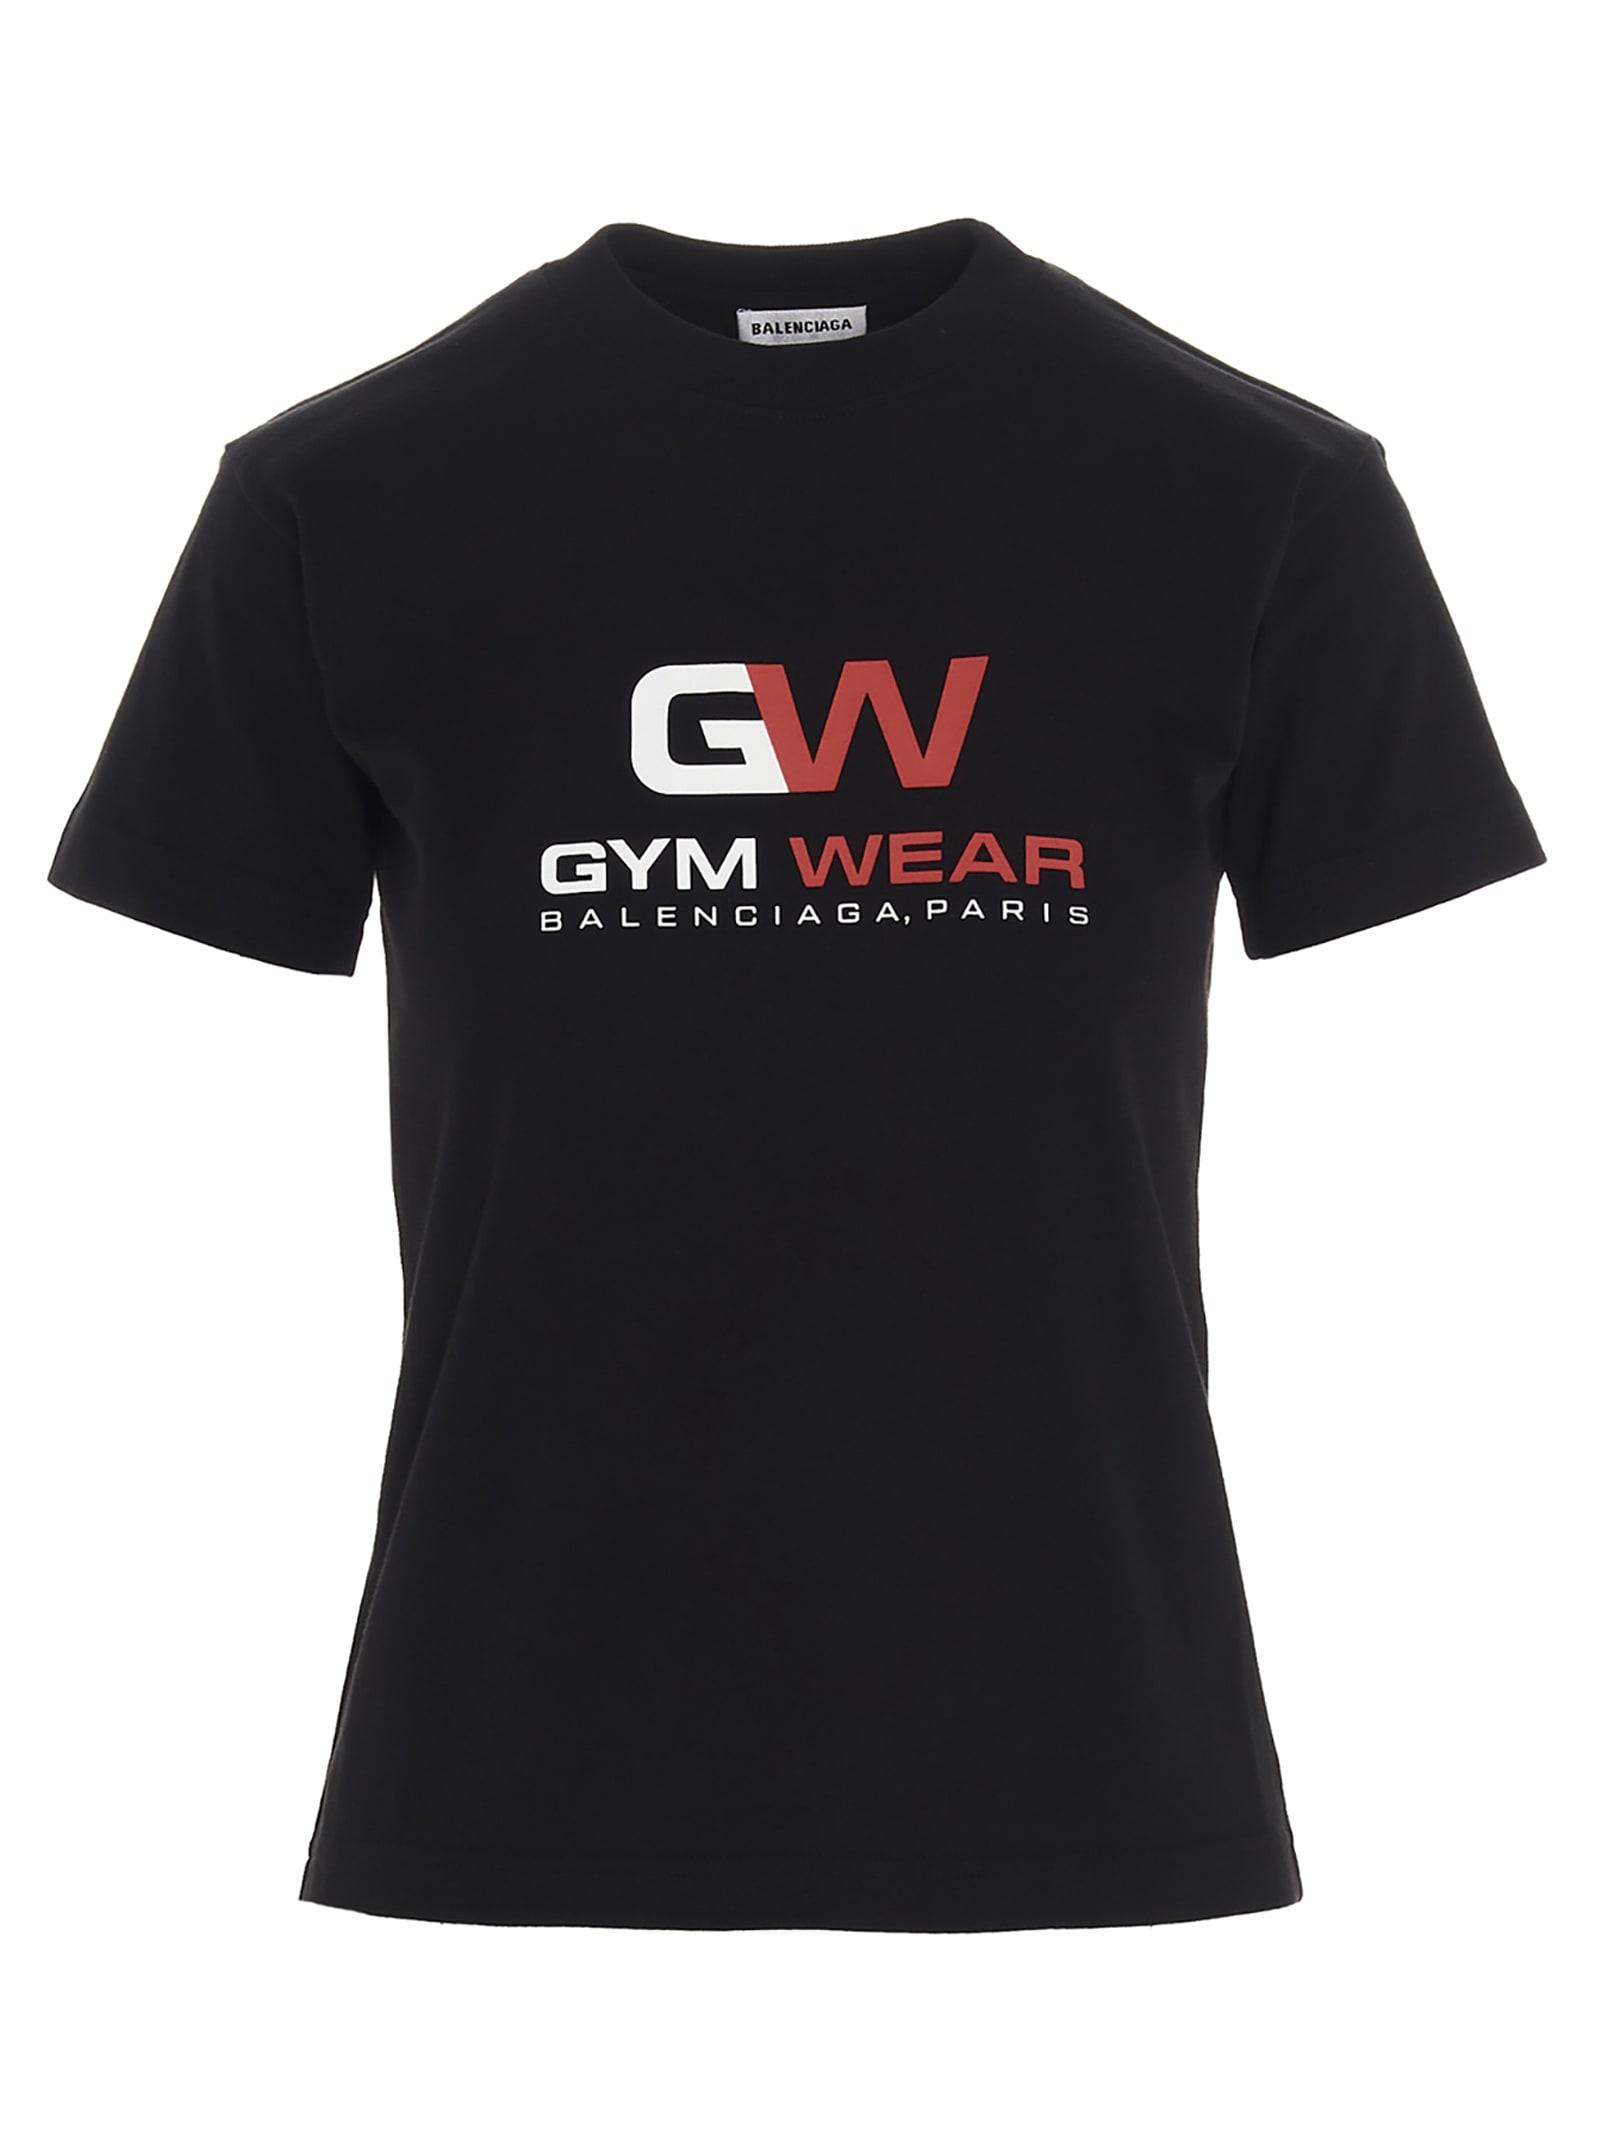 Balenciaga gym Wear T-shirt